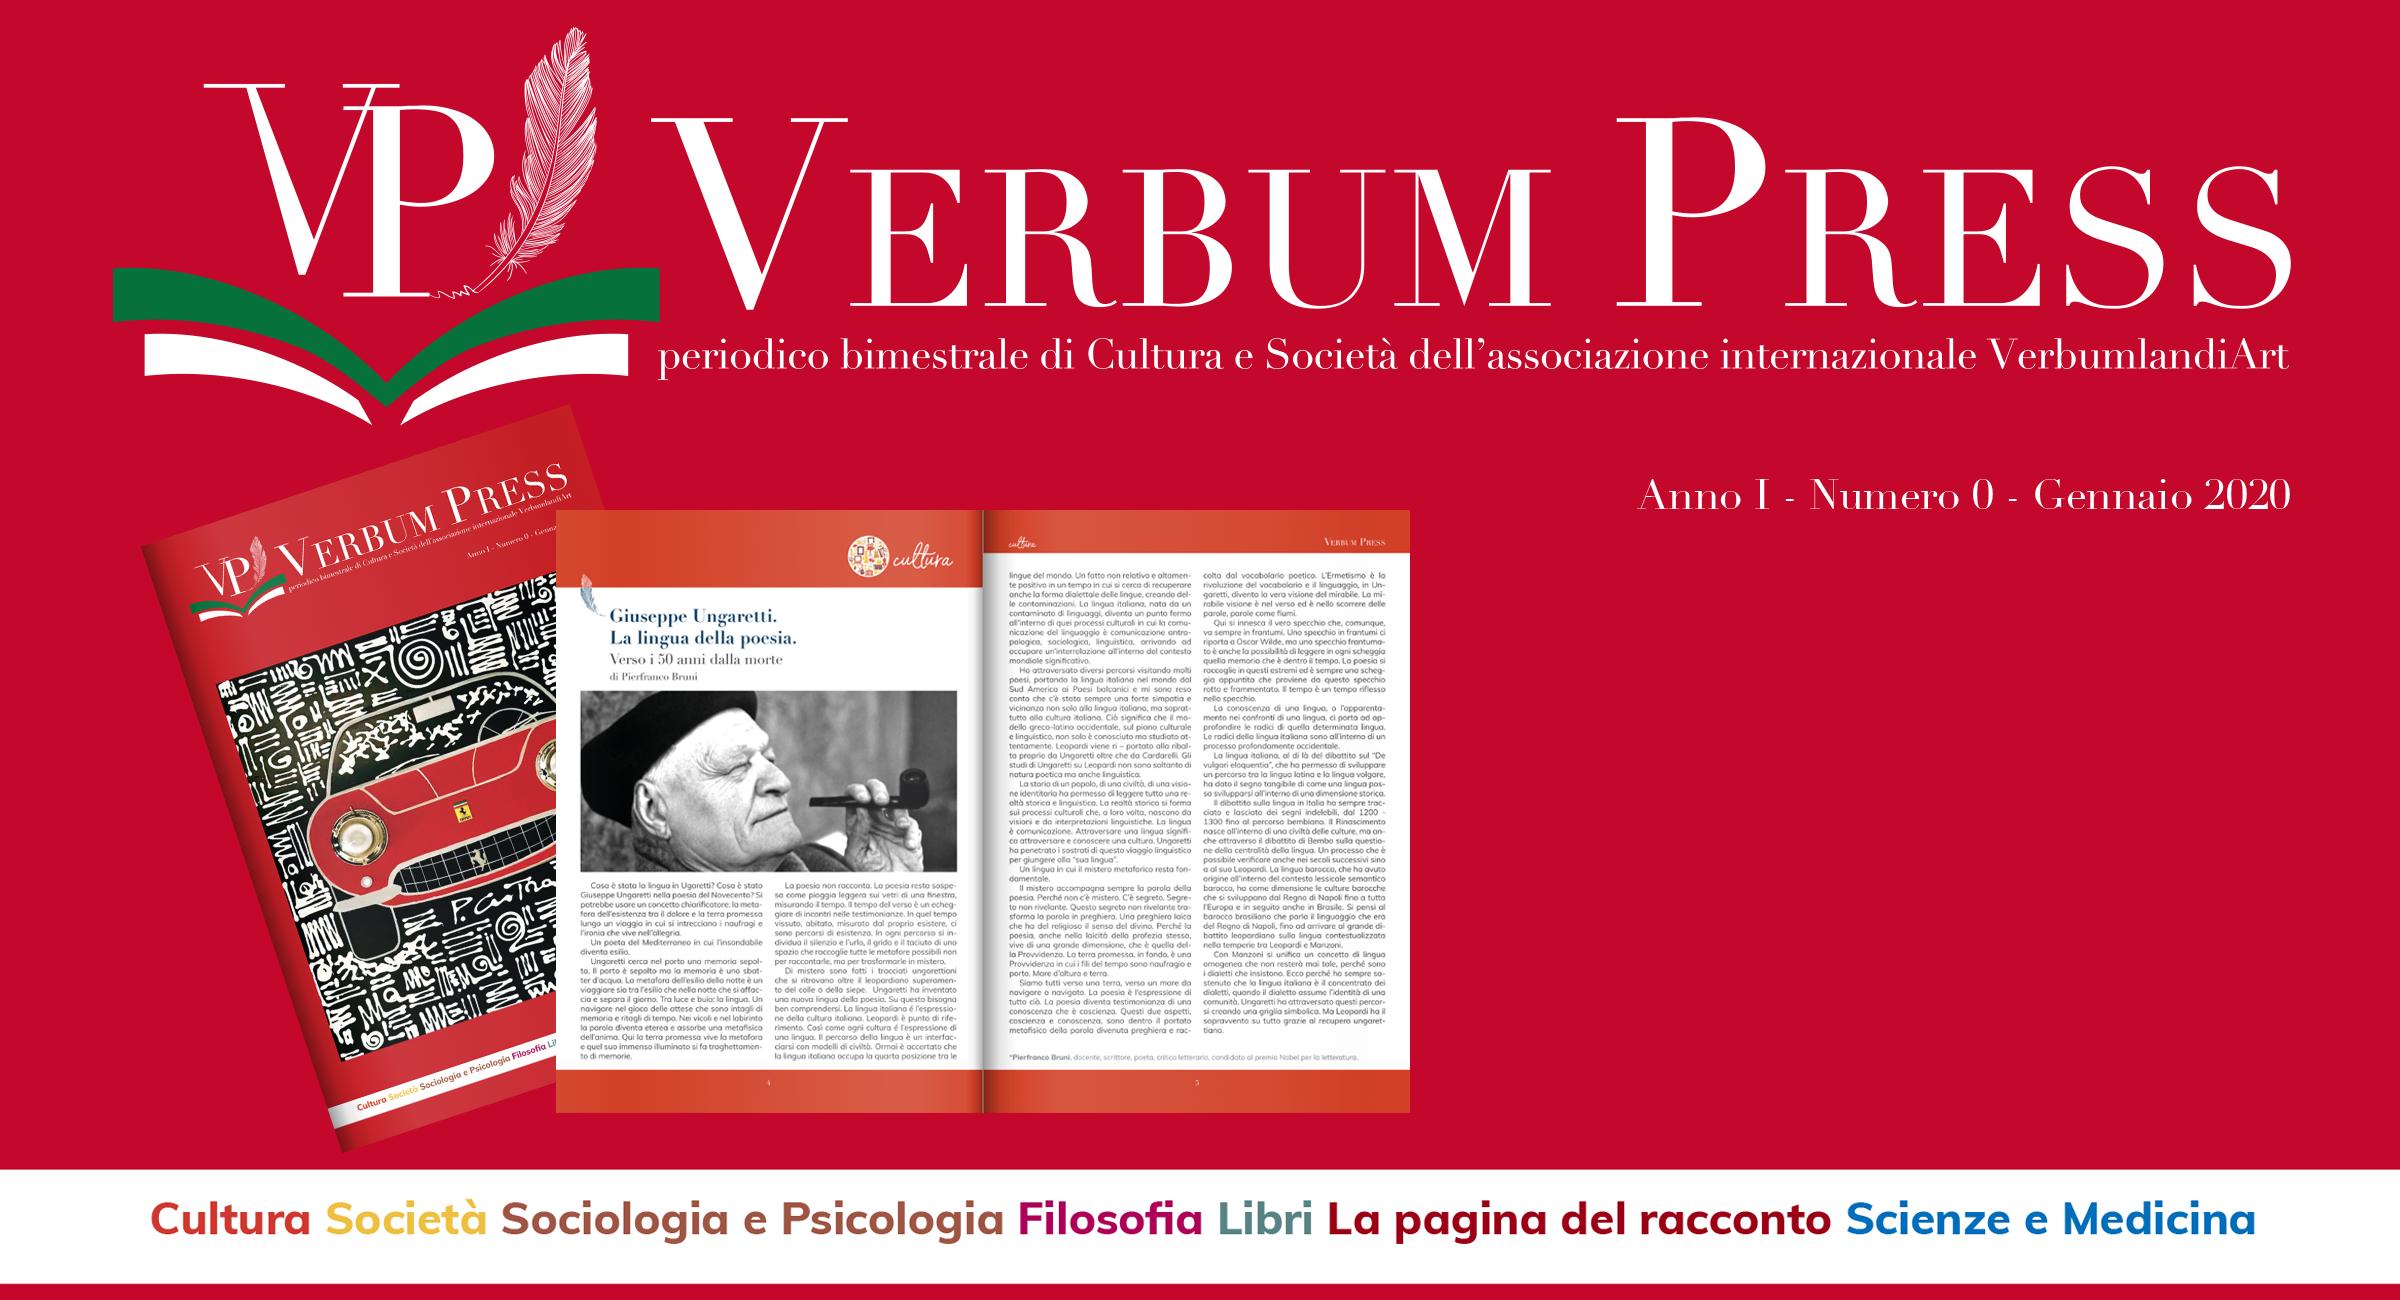 Verbum Press, nasce la nuova rivista culturale